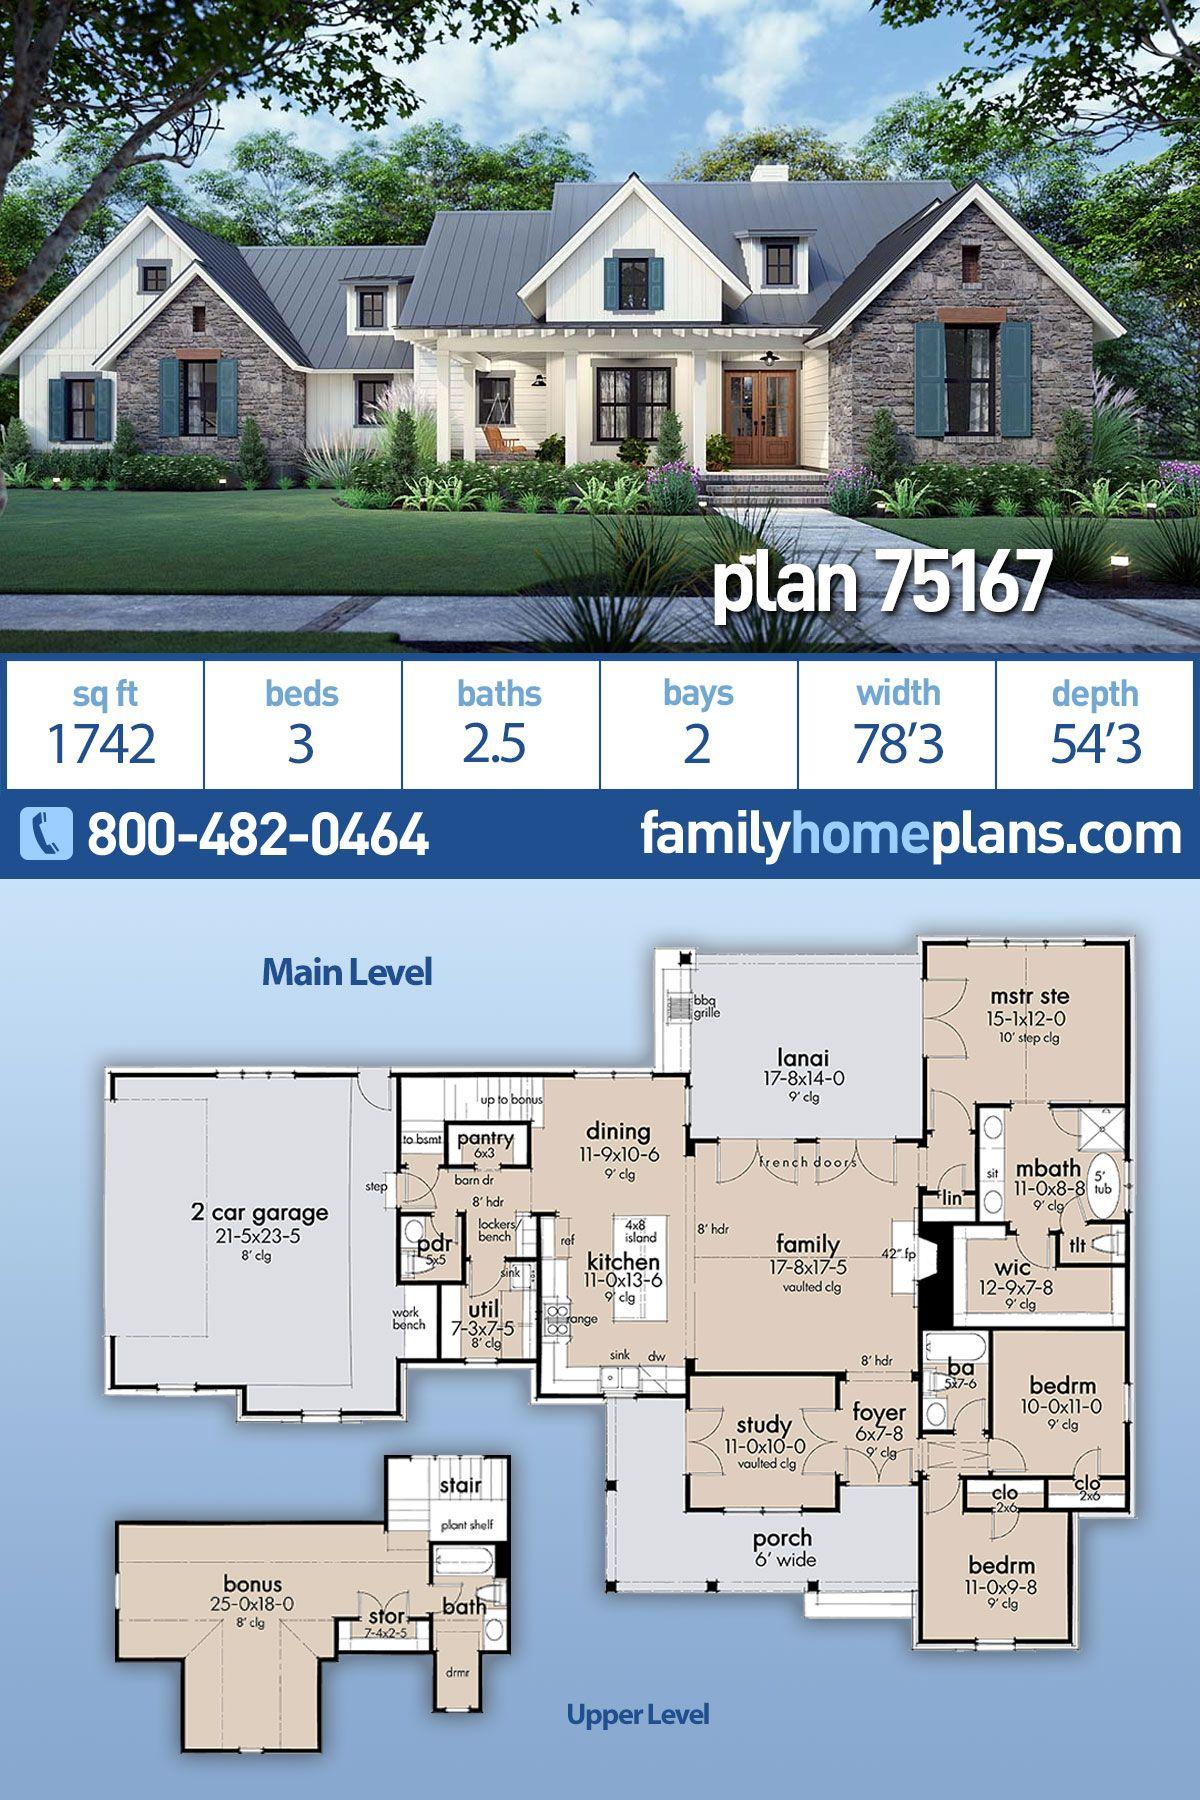 Southern Style House Plan 75167 With 3 Bed 3 Bath 2 Car Garage In 2020 Farmhouse Plans New House Plans House Plans Farmhouse